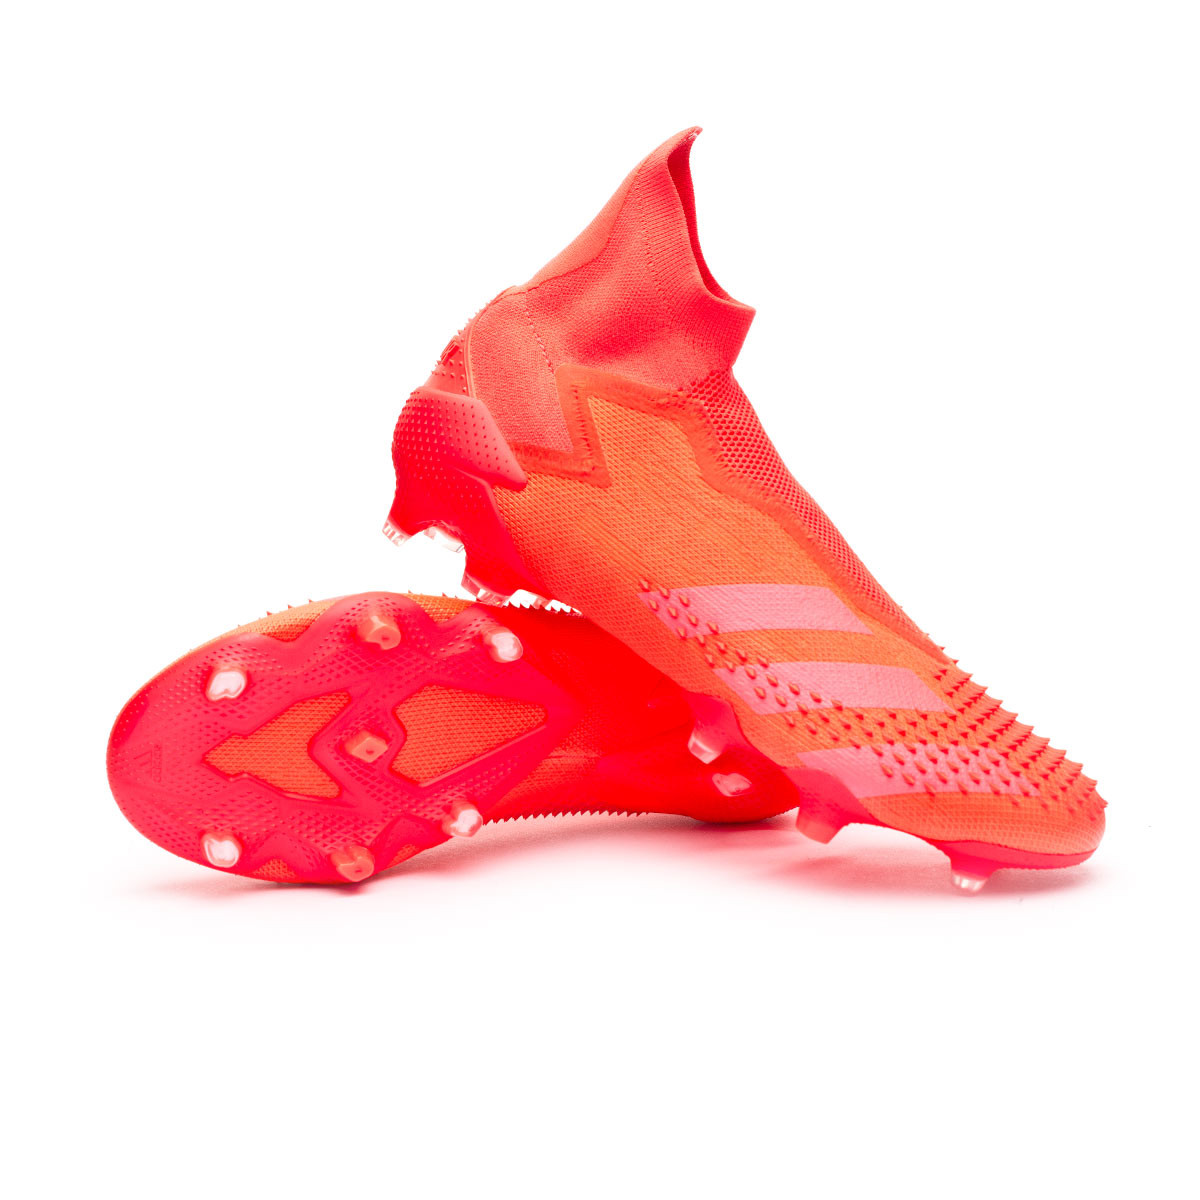 hogar El actual Imaginativo  Football Boots adidas Predator 20+ FG Pop - Football store Fútbol Emotion